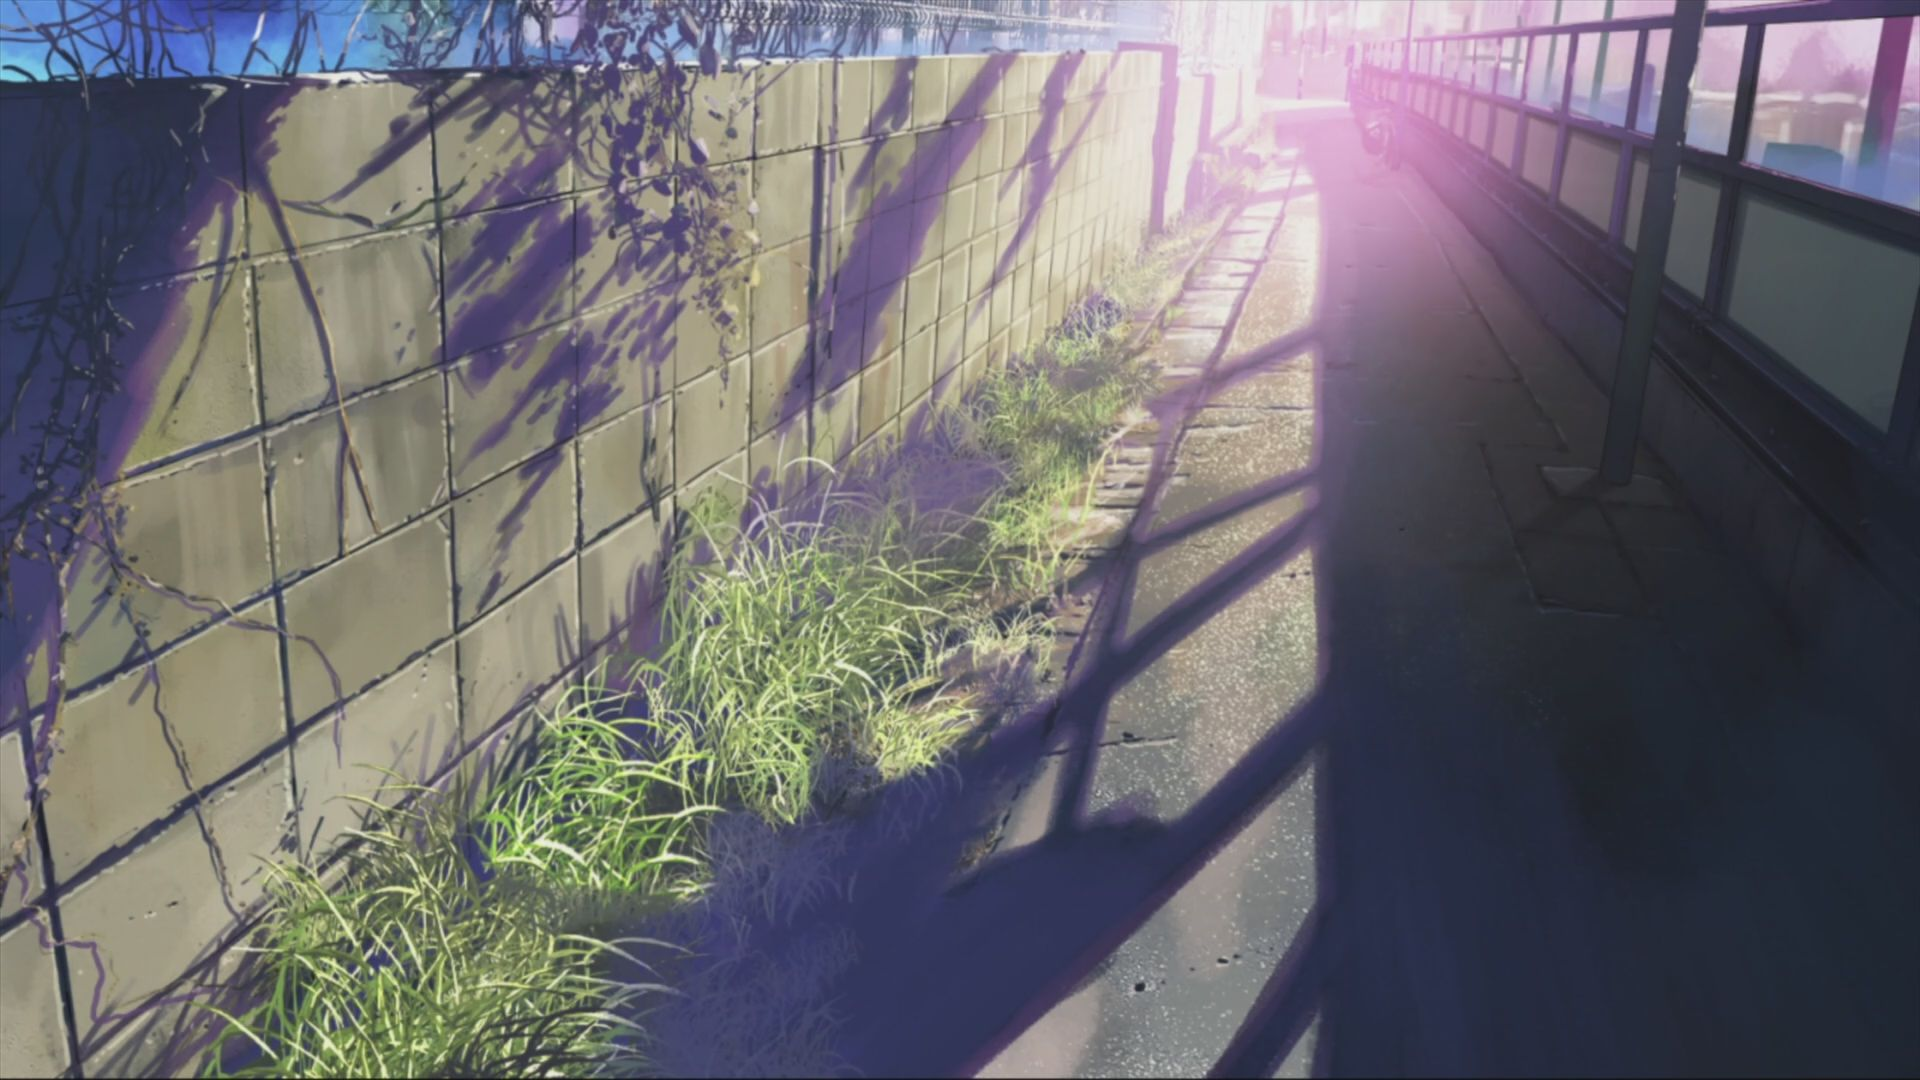 Makoto Shinkai (With images) Anime pixel art